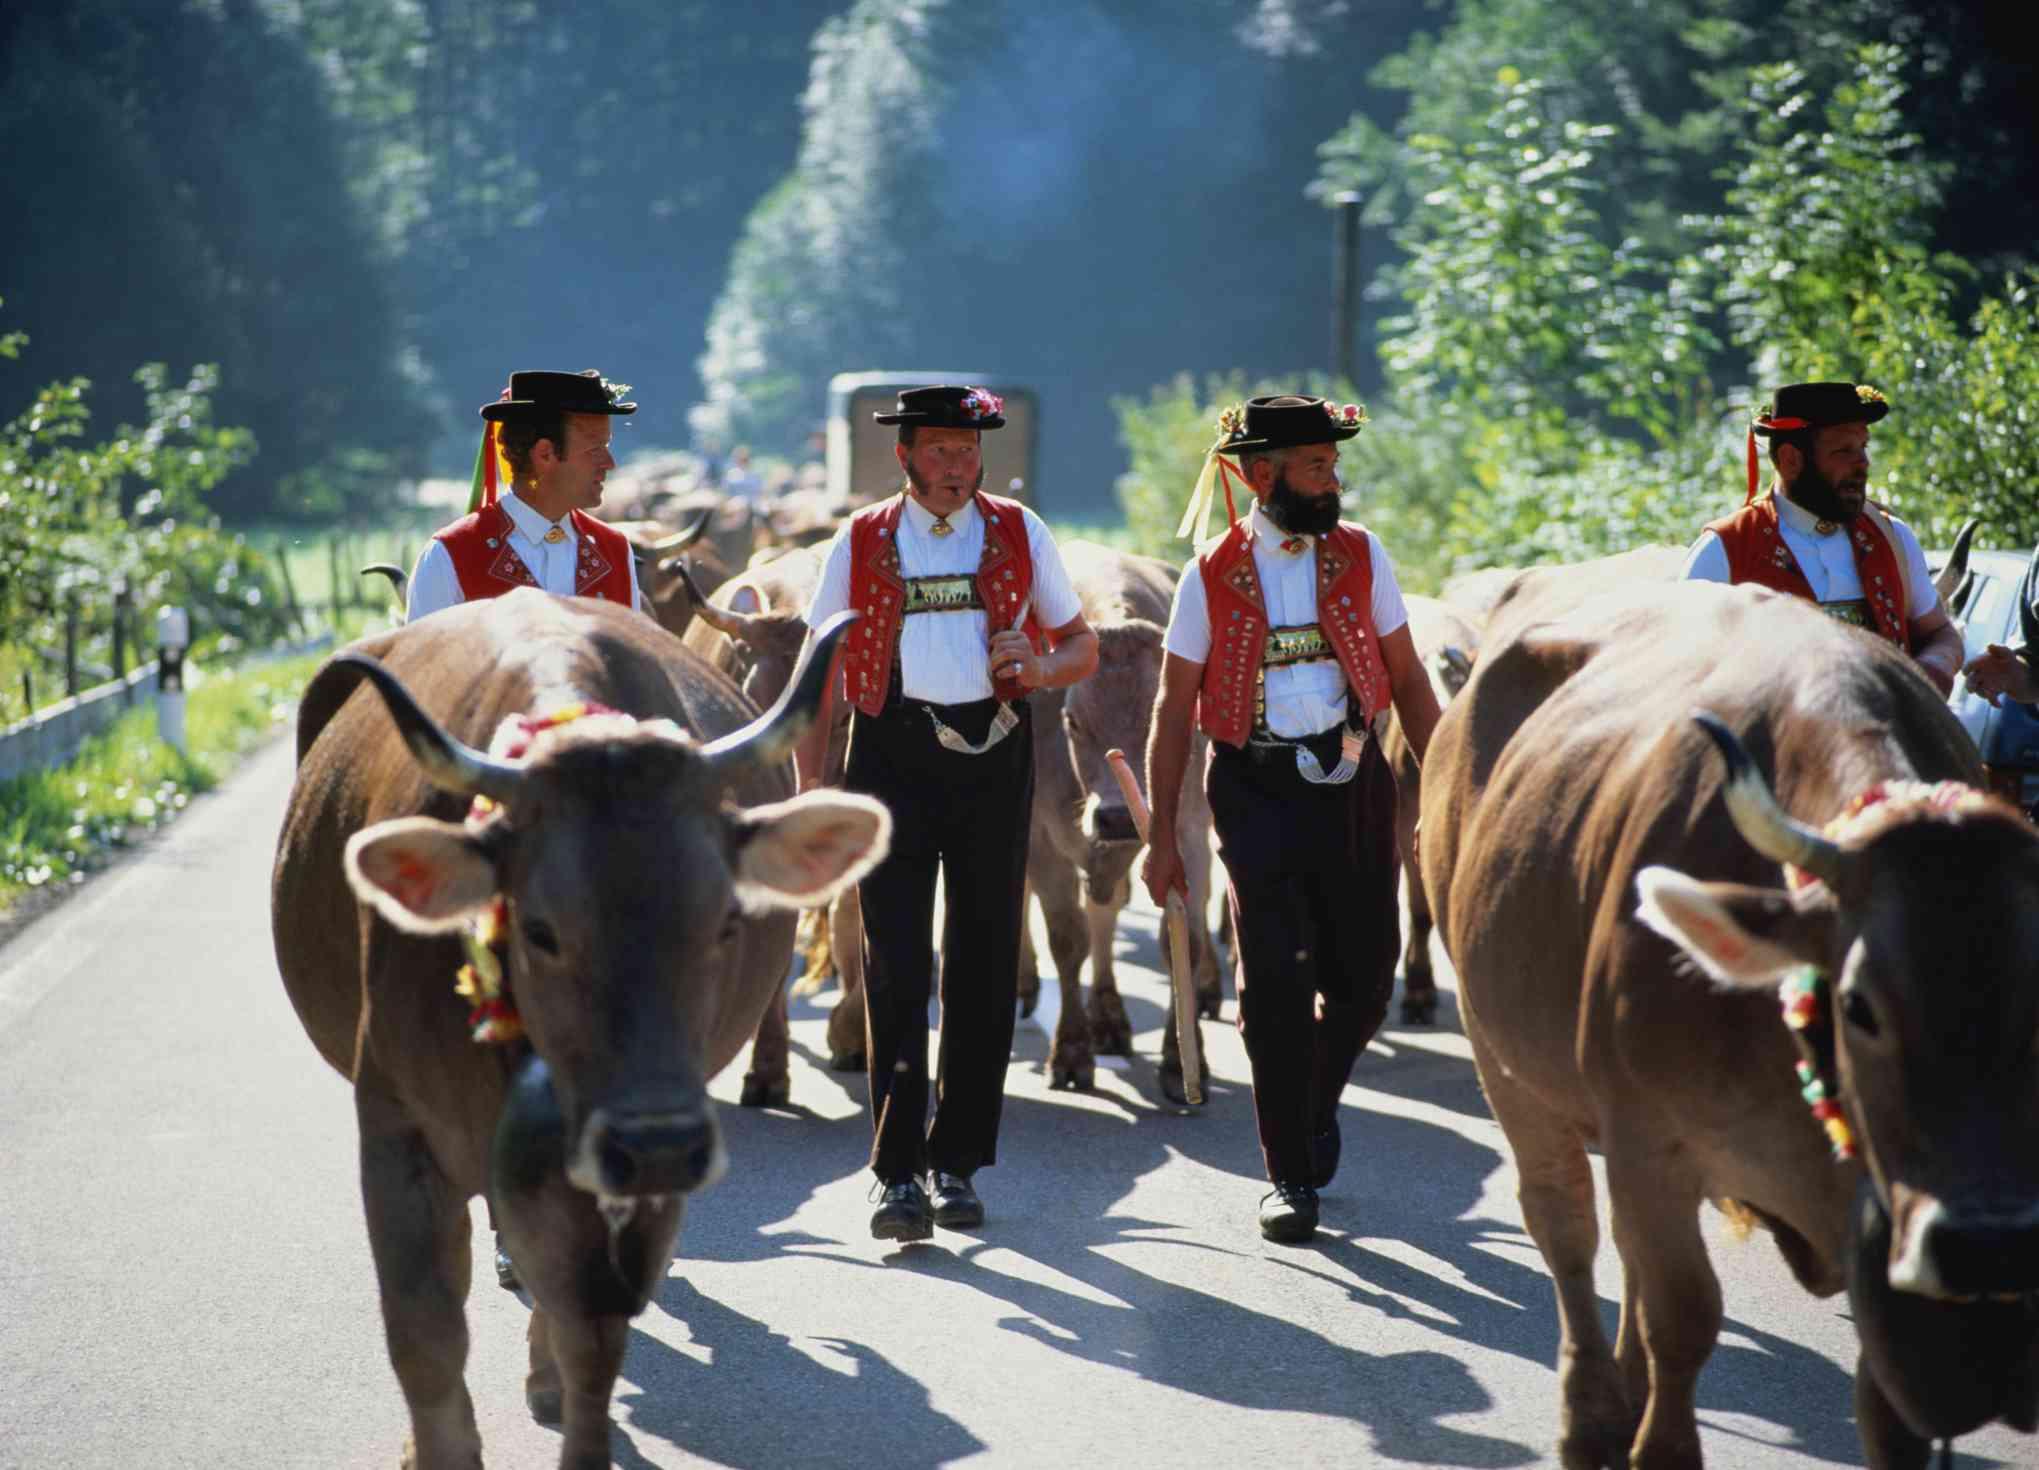 Men in traditional costume, Appenzell, Switzerland